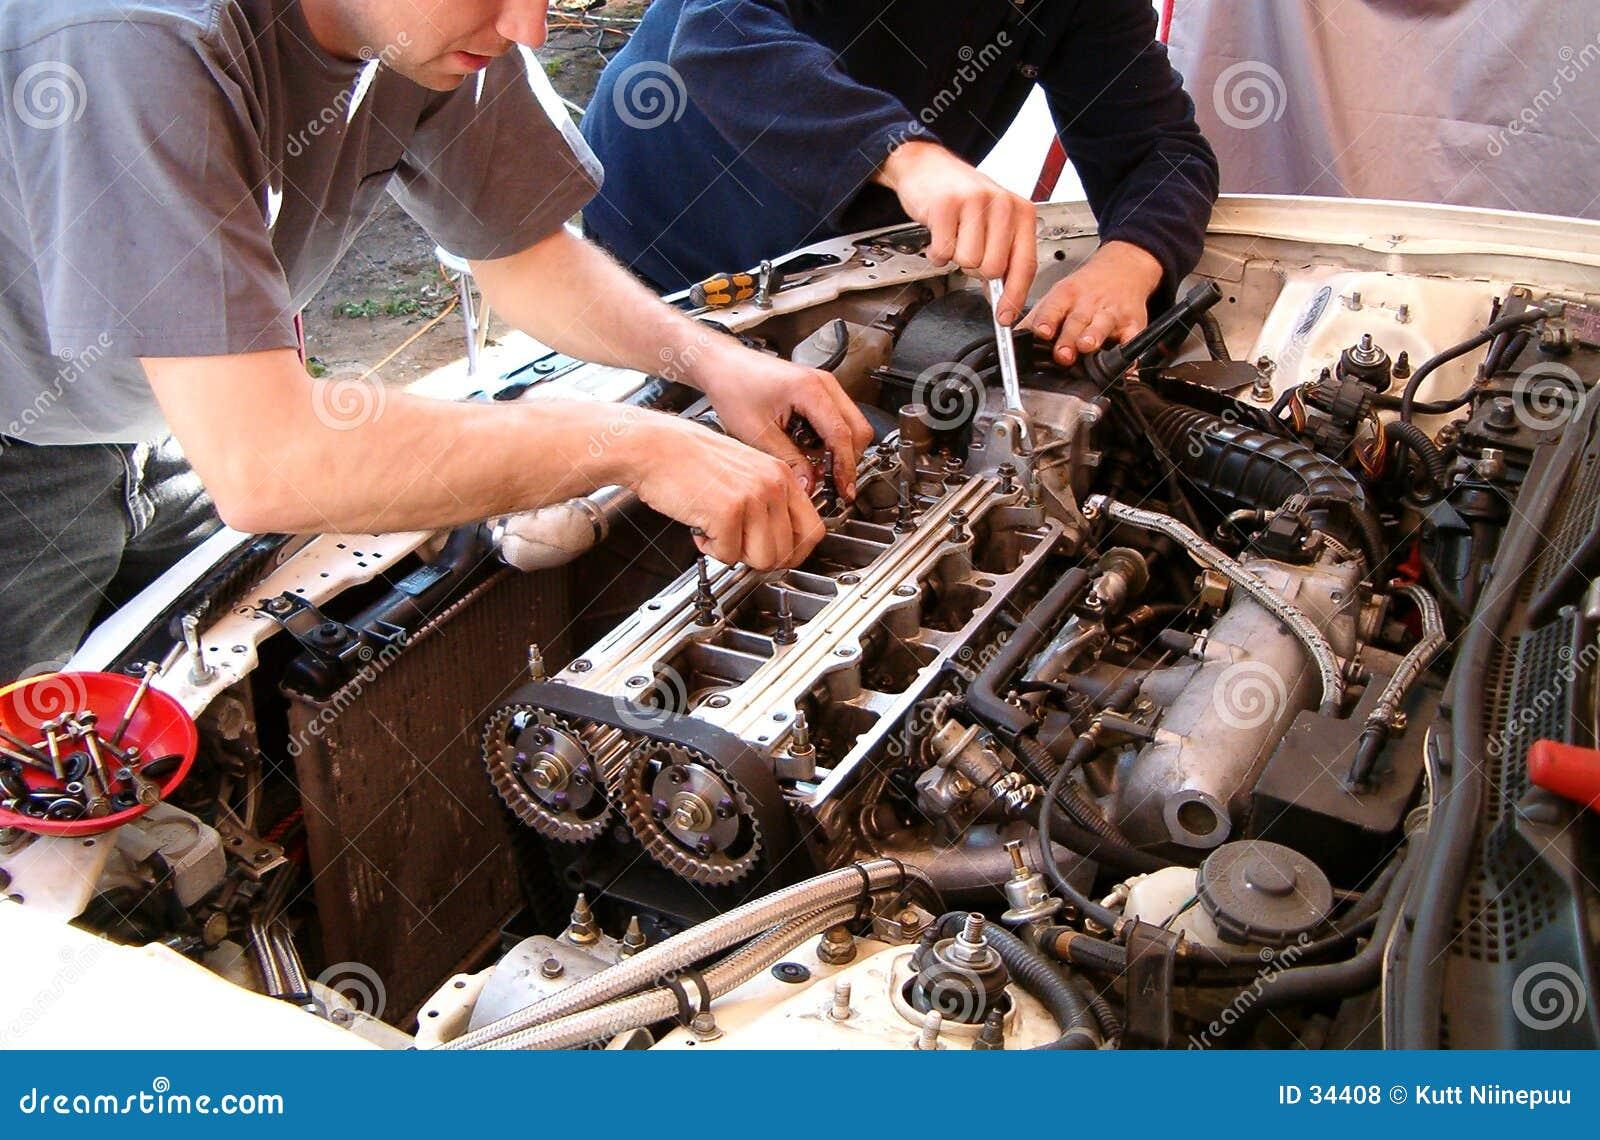 Download Mecánicos foto de archivo. Imagen de assembling, motor, camshafts - 34408